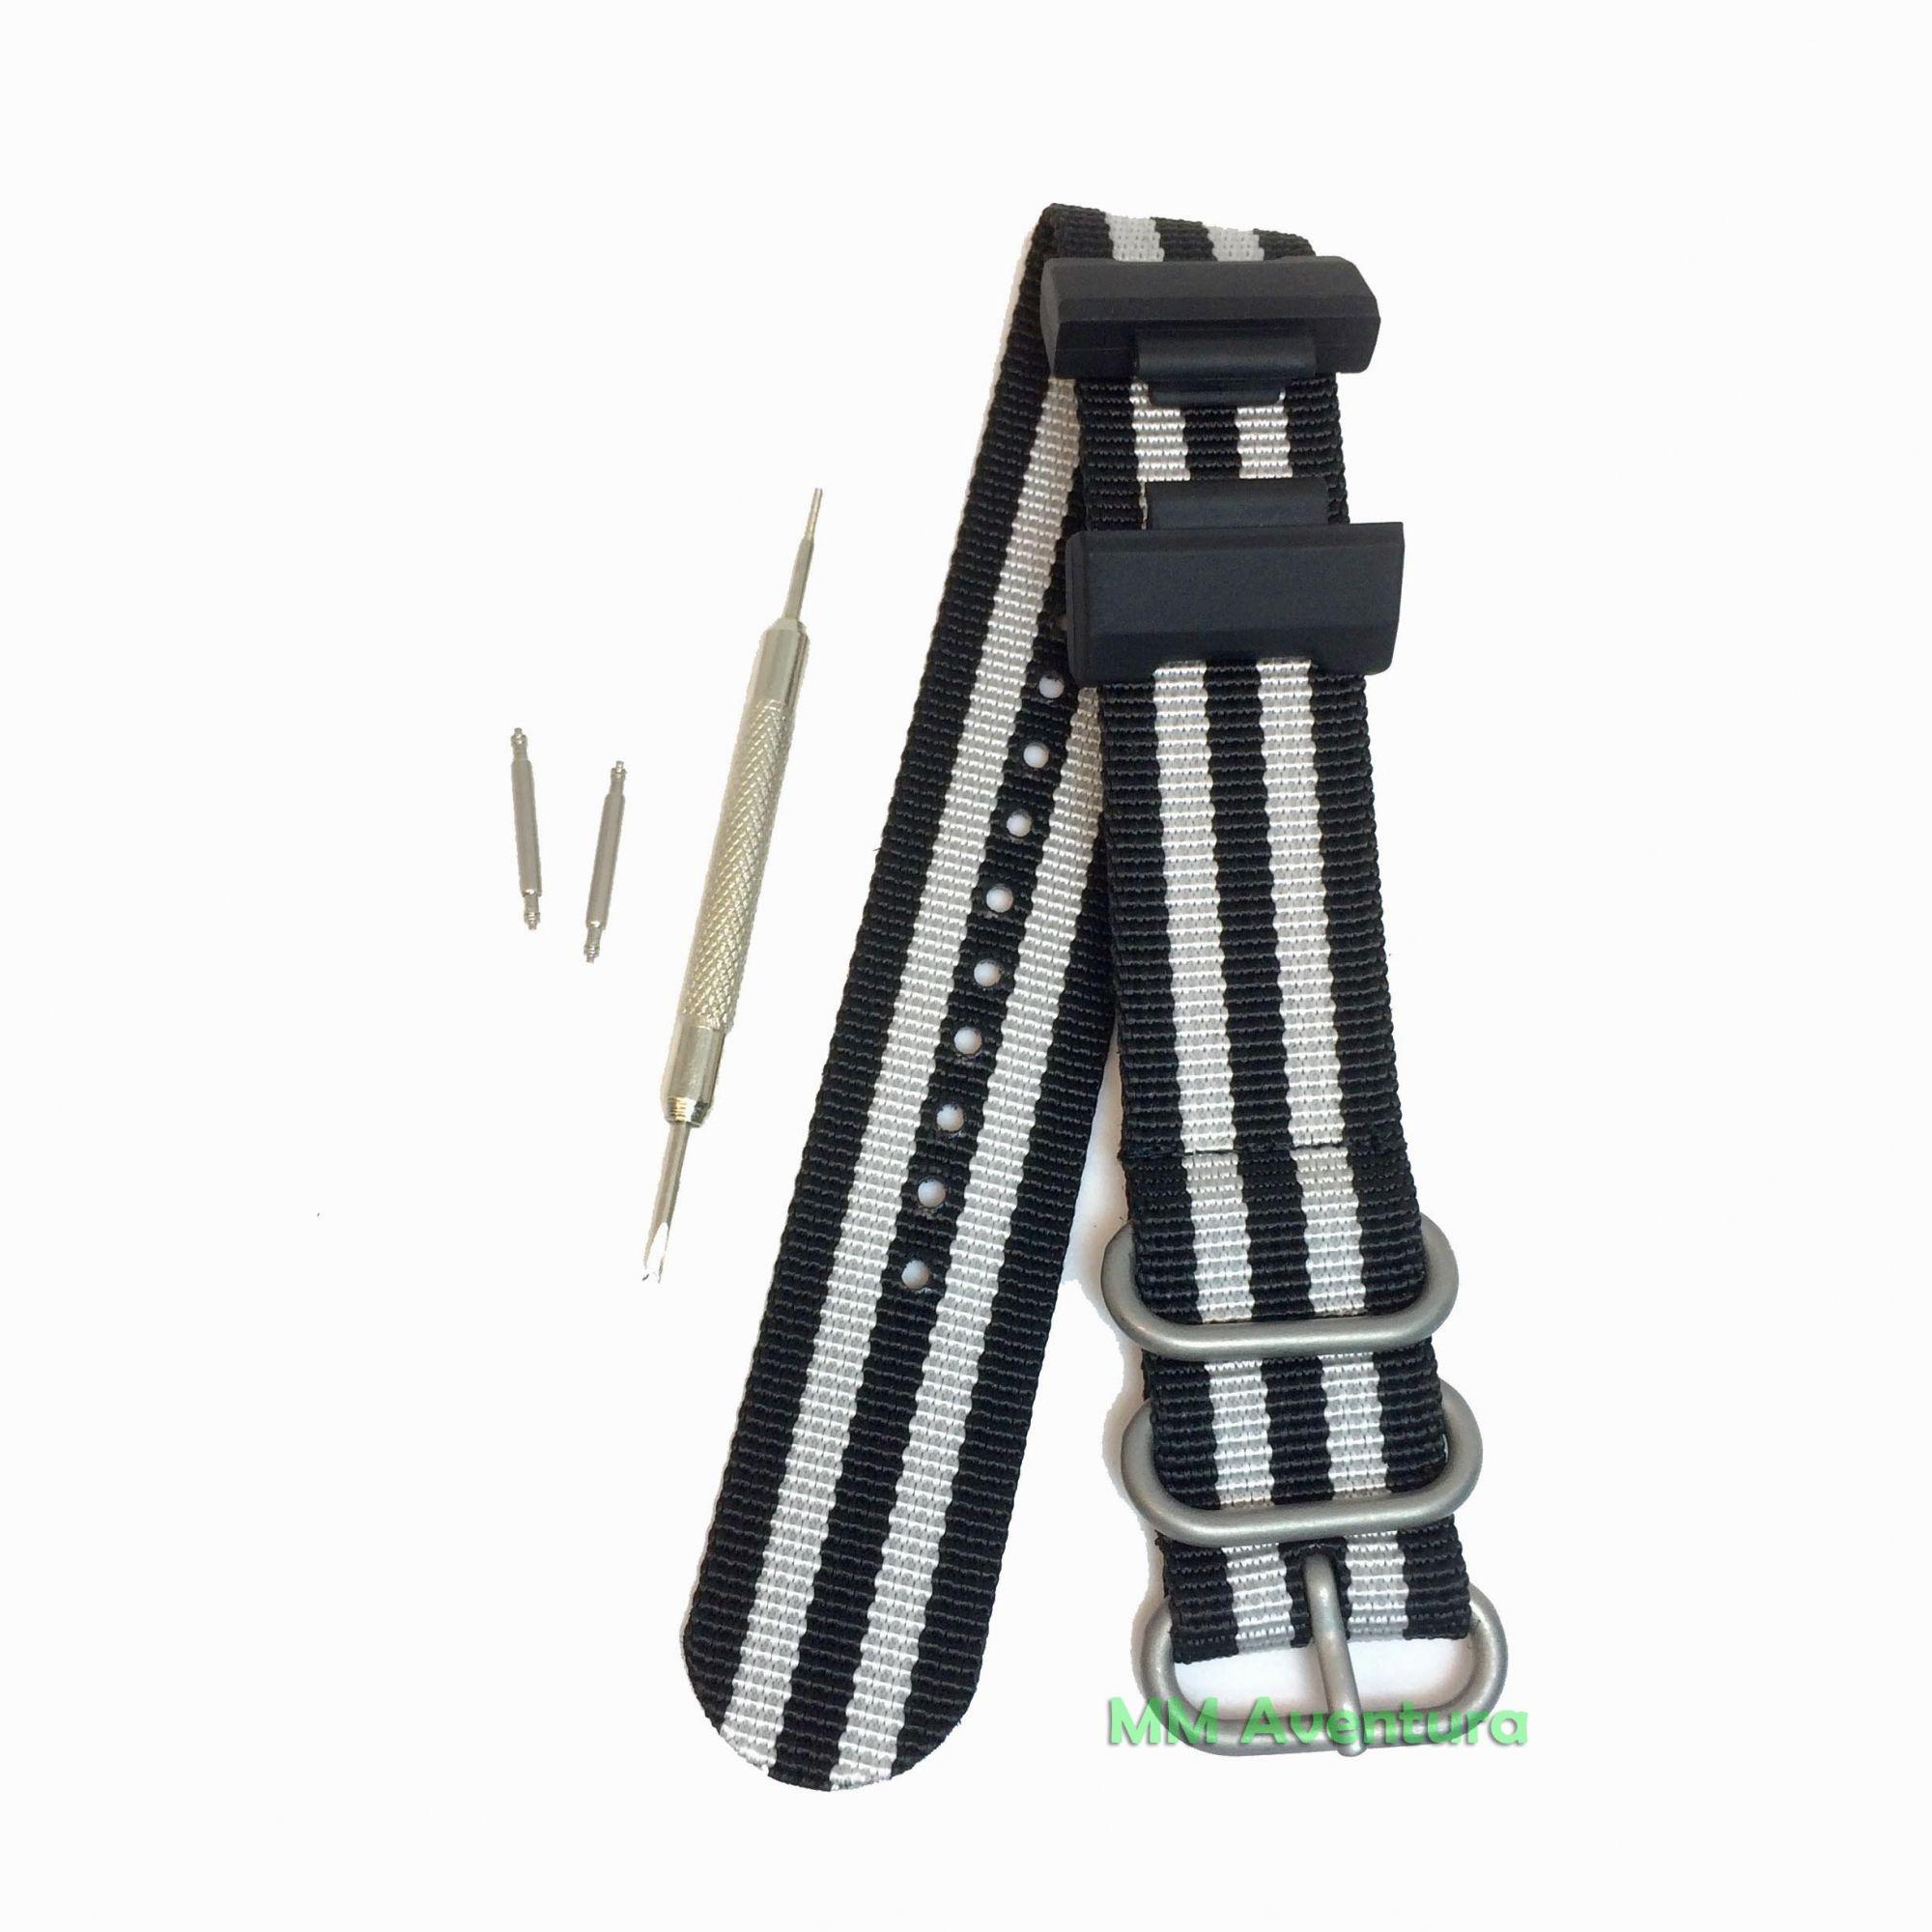 Pulseira de Nylon Estilo Zulu 24mm para G-Shock Bond Silver Stripe DW5600 Etc